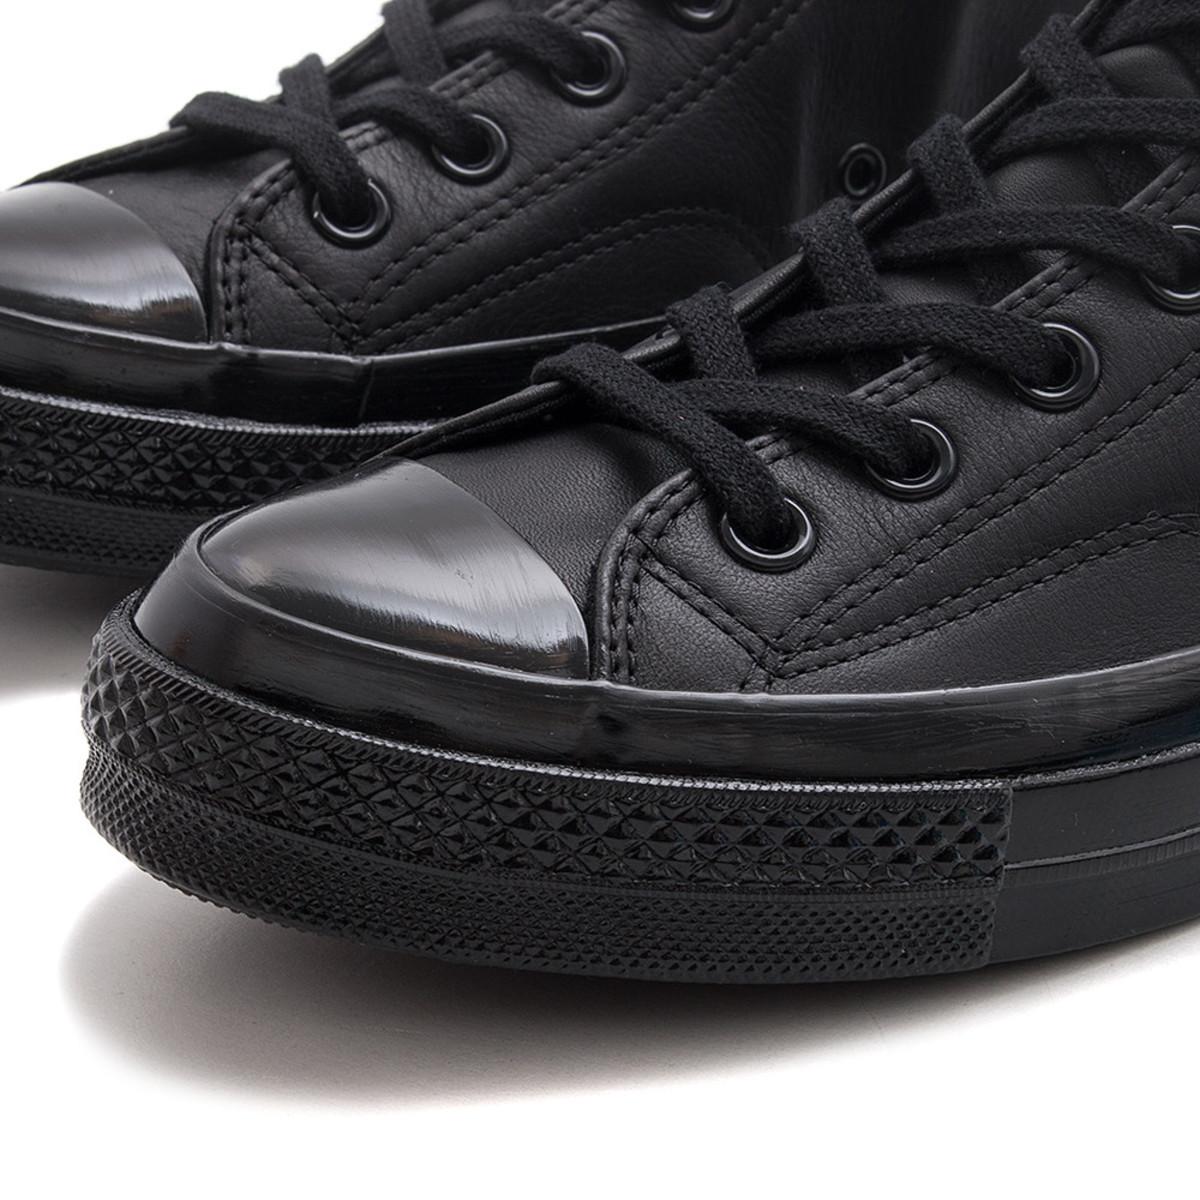 d3050ff76a58 Converse Chuck Taylor All Star 70 Mono Leather Hi - Black